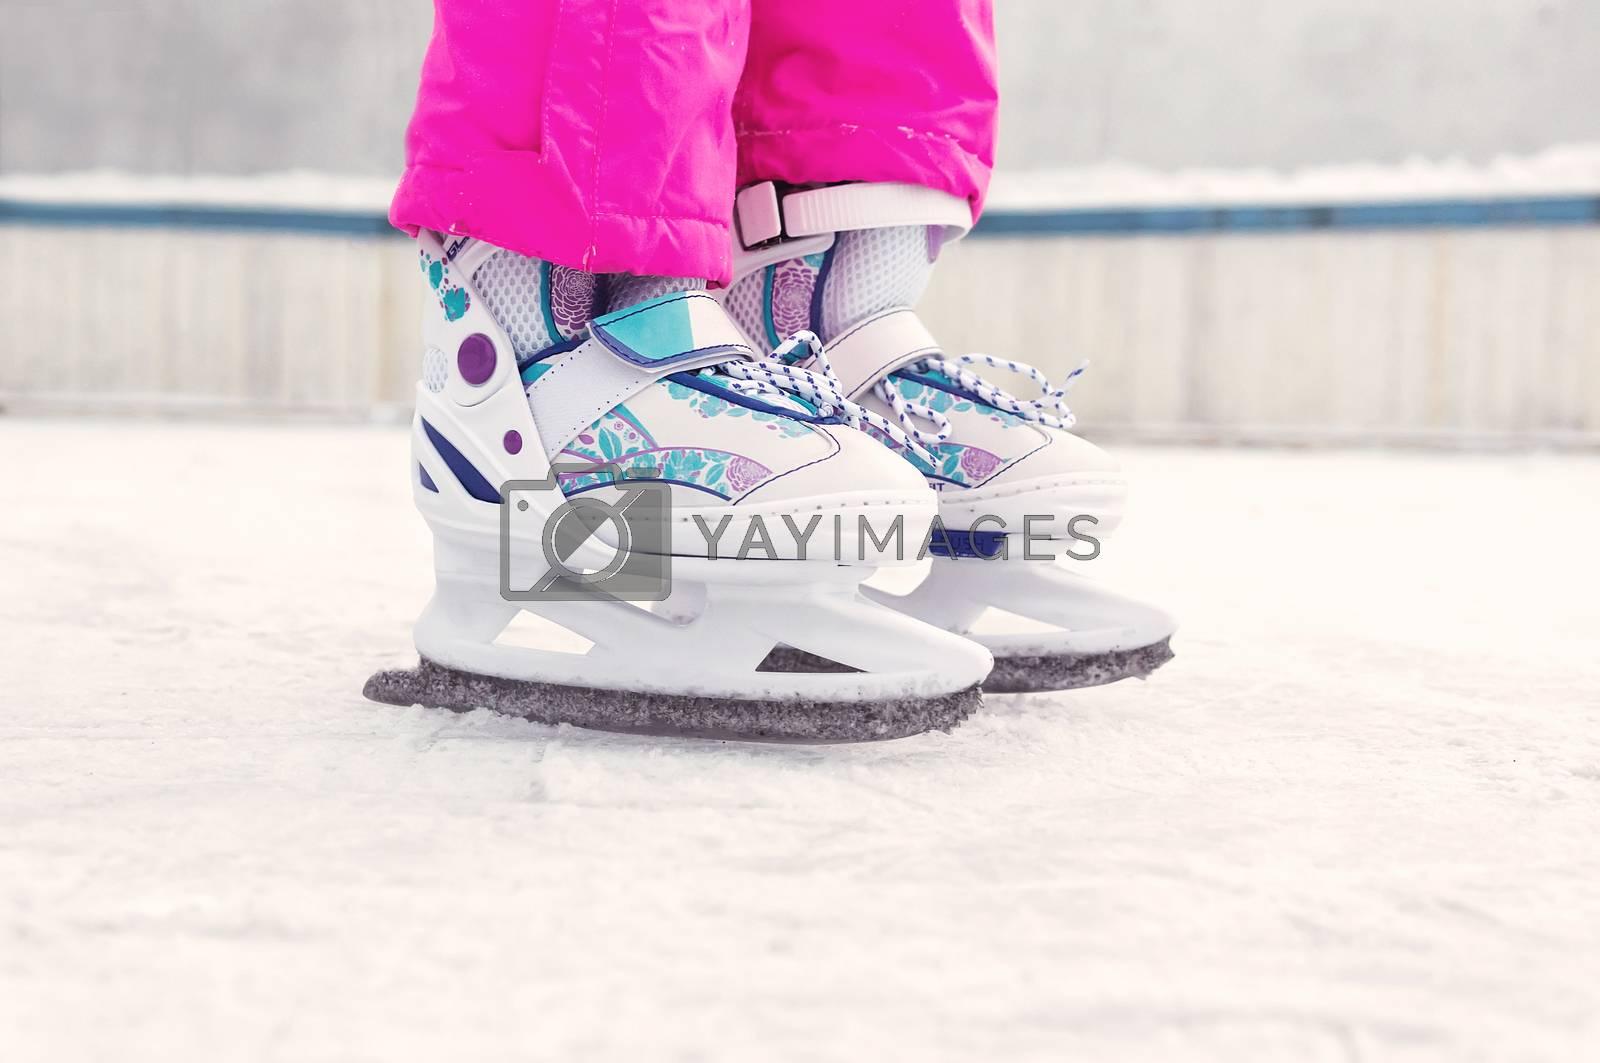 Figure skating. Children white skating on ice. Children's winter sports. Outdoor activities in winter.